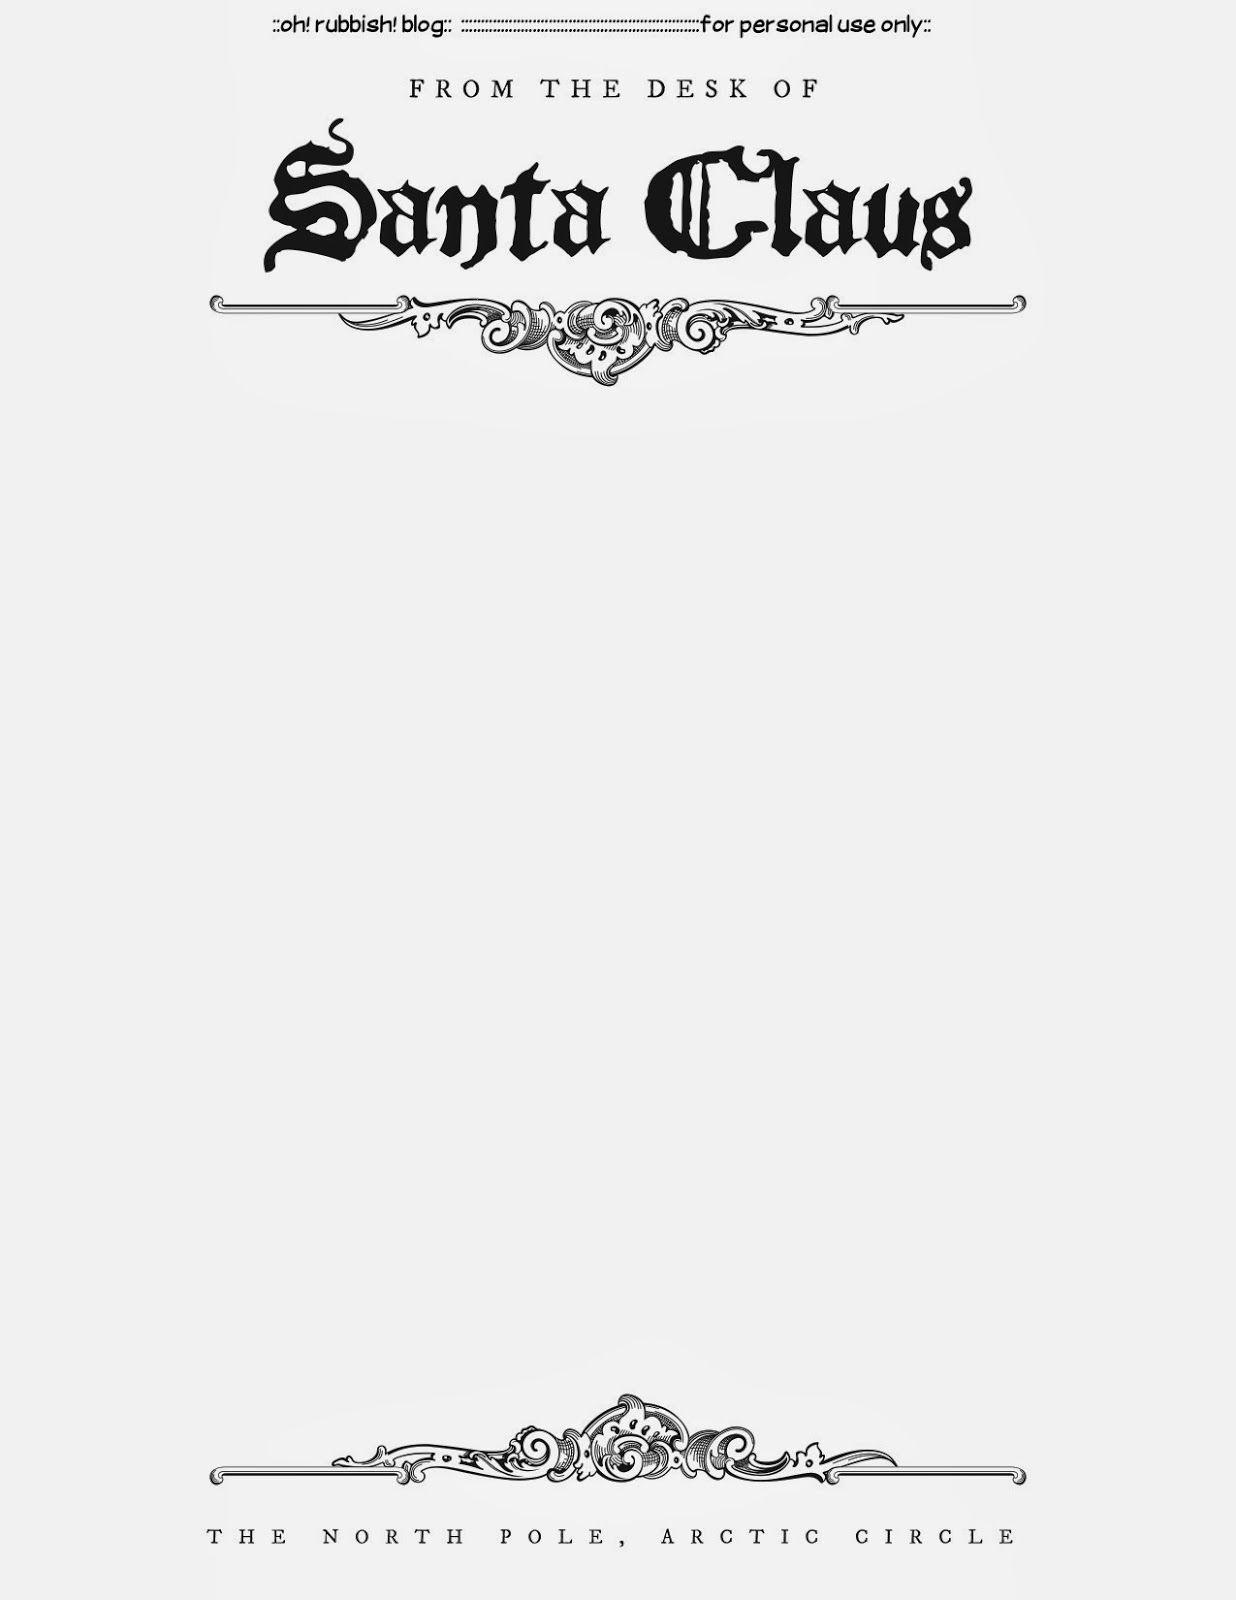 Santa Letter Templates | Christmas Printables 5 | Santa Letter - Free Printable Letter From Santa Template